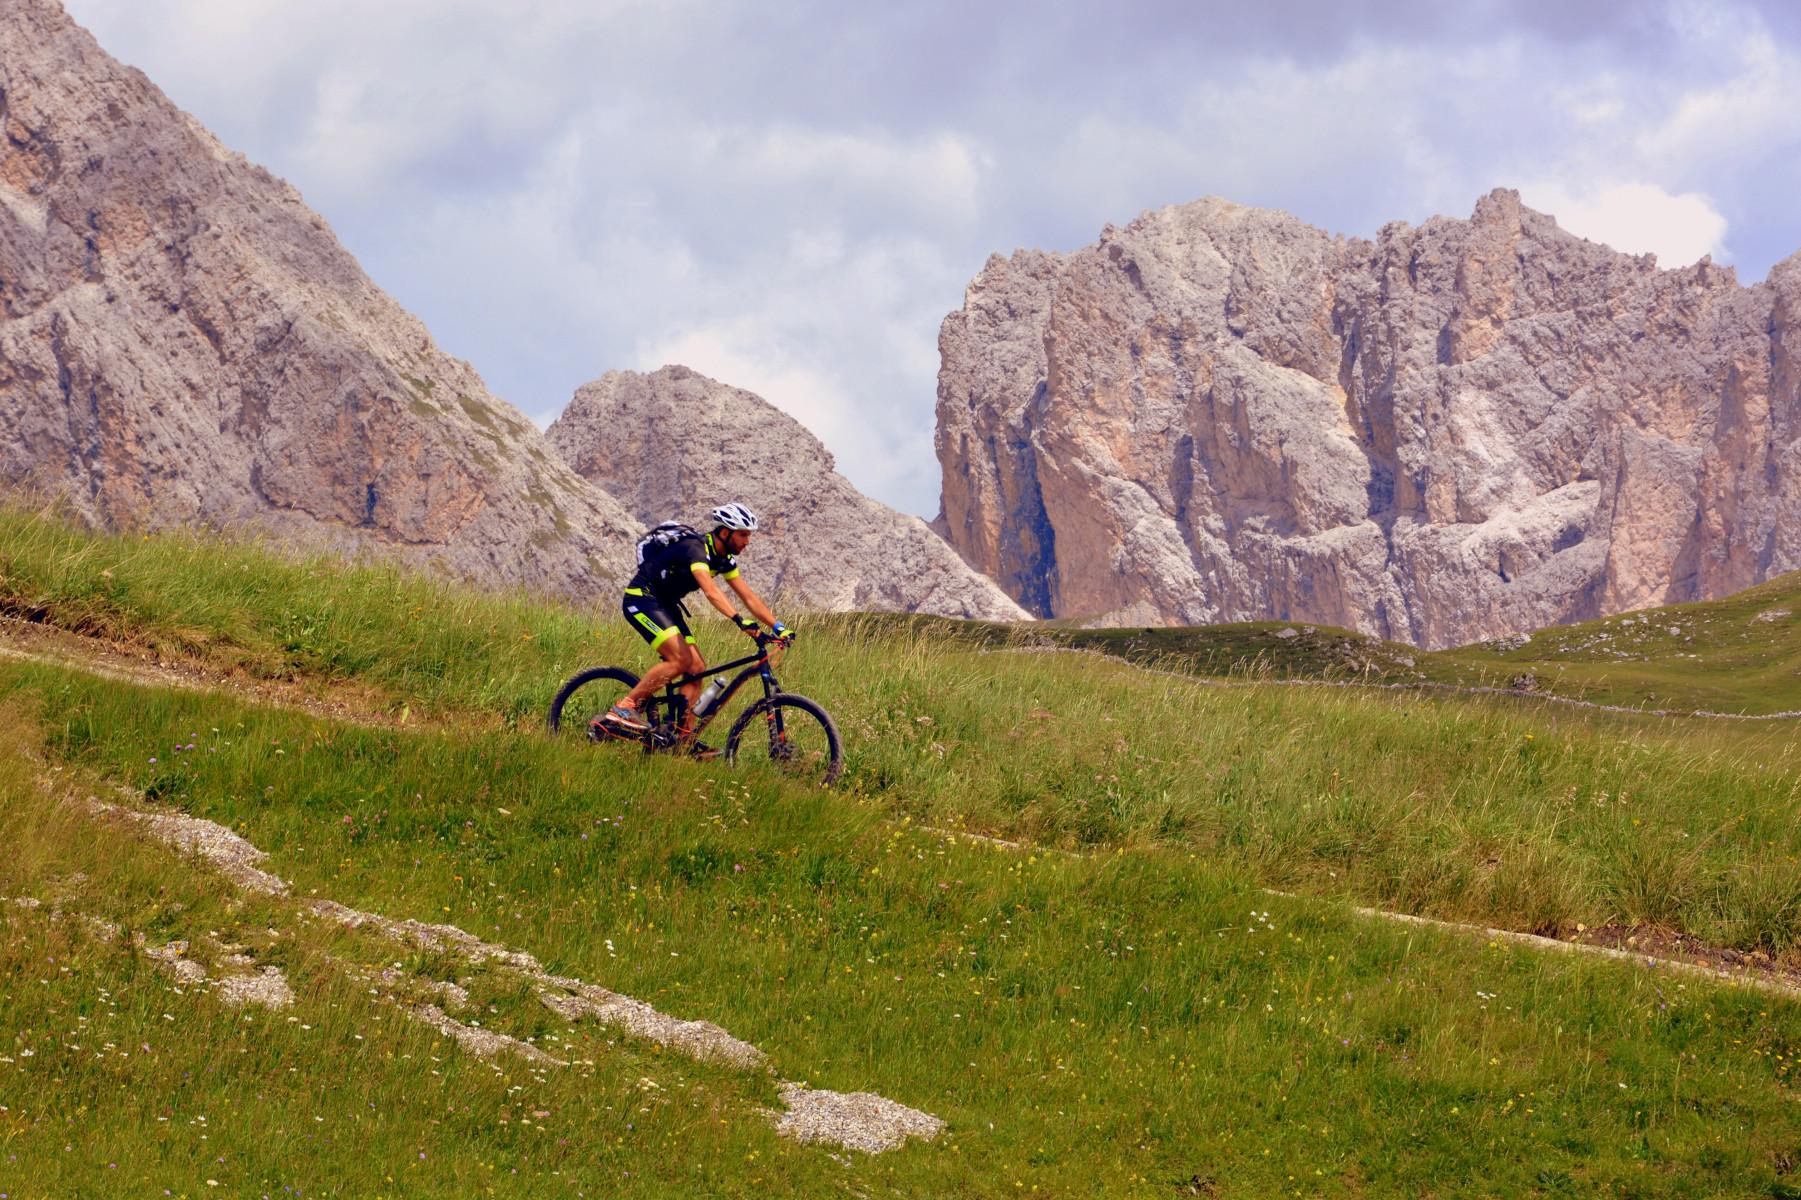 Mountain-bike downhill in Val di Sole